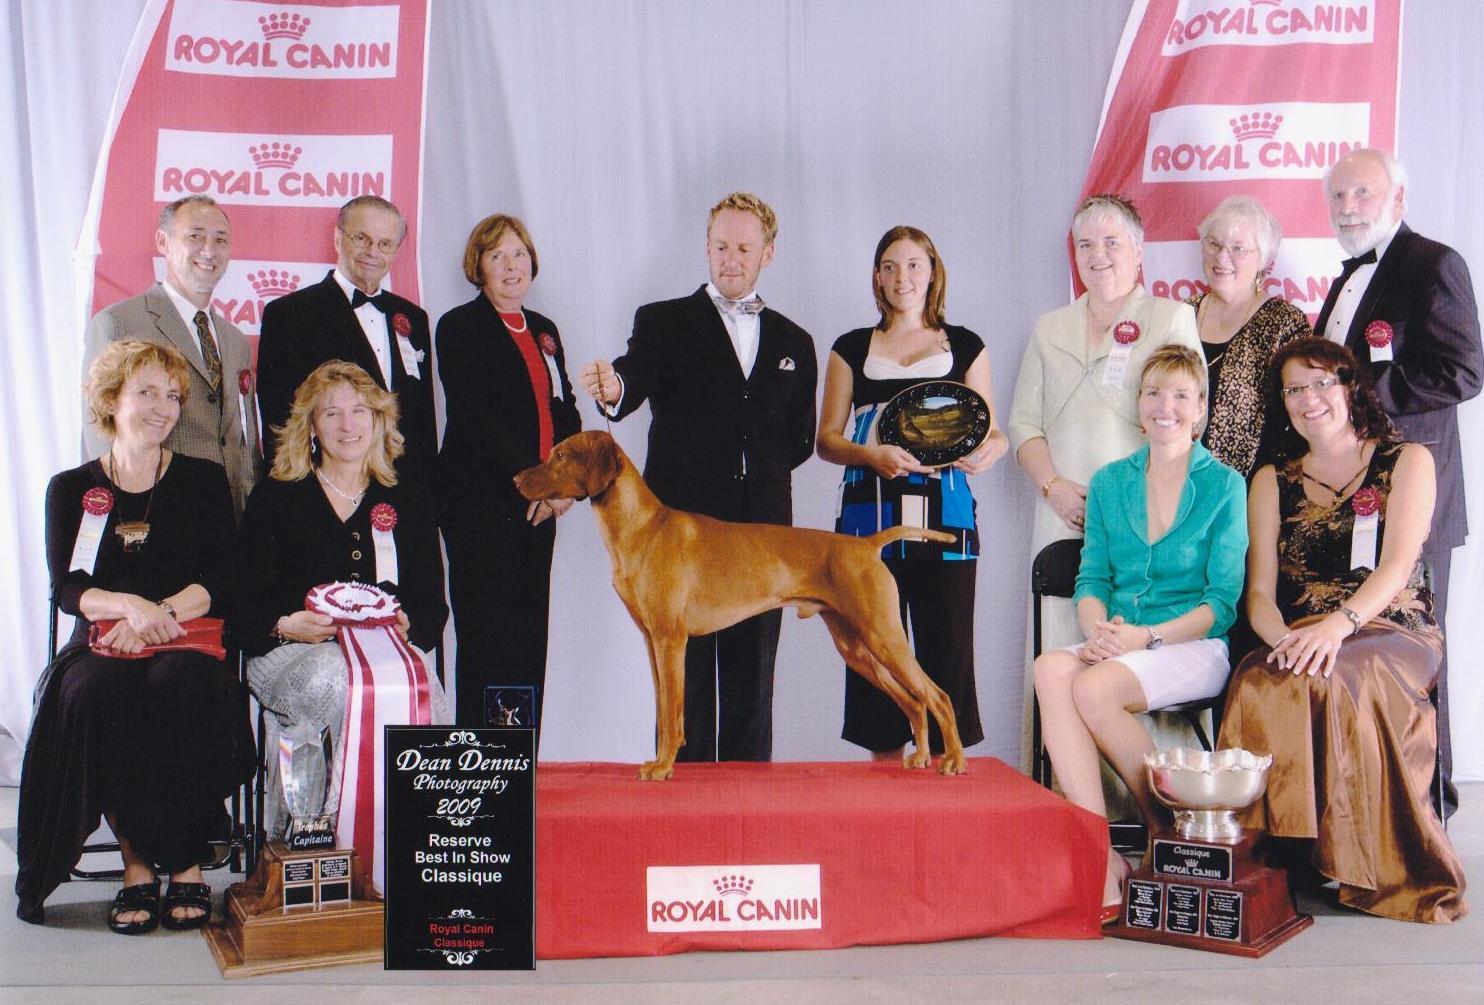 Classique Royal Canin